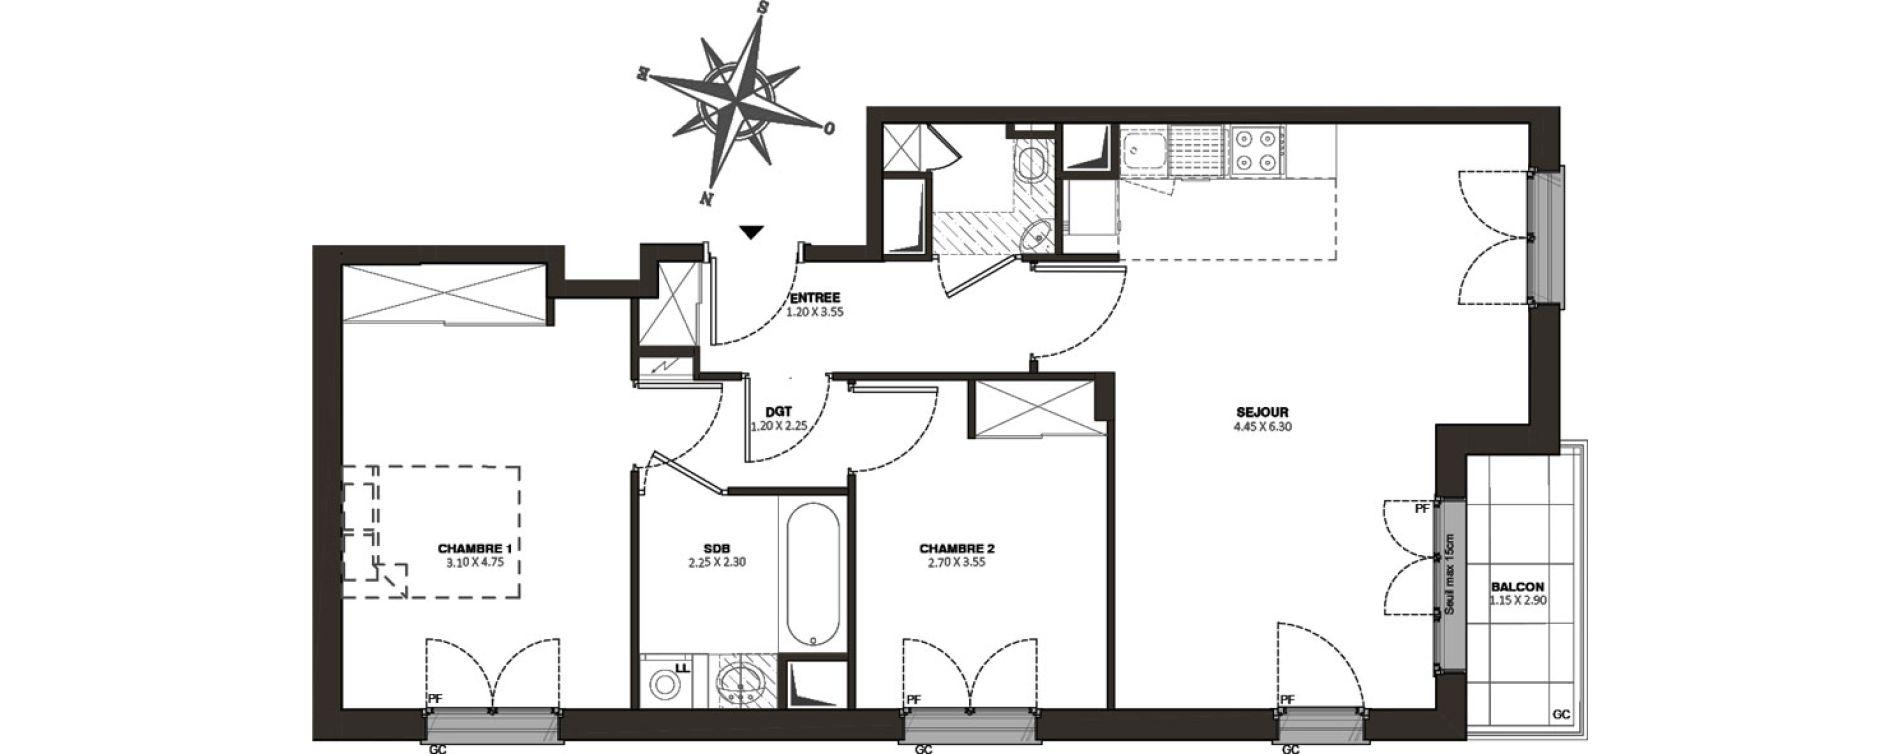 Appartement T3 de 64,55 m2 à Viroflay Rive droite viroflay